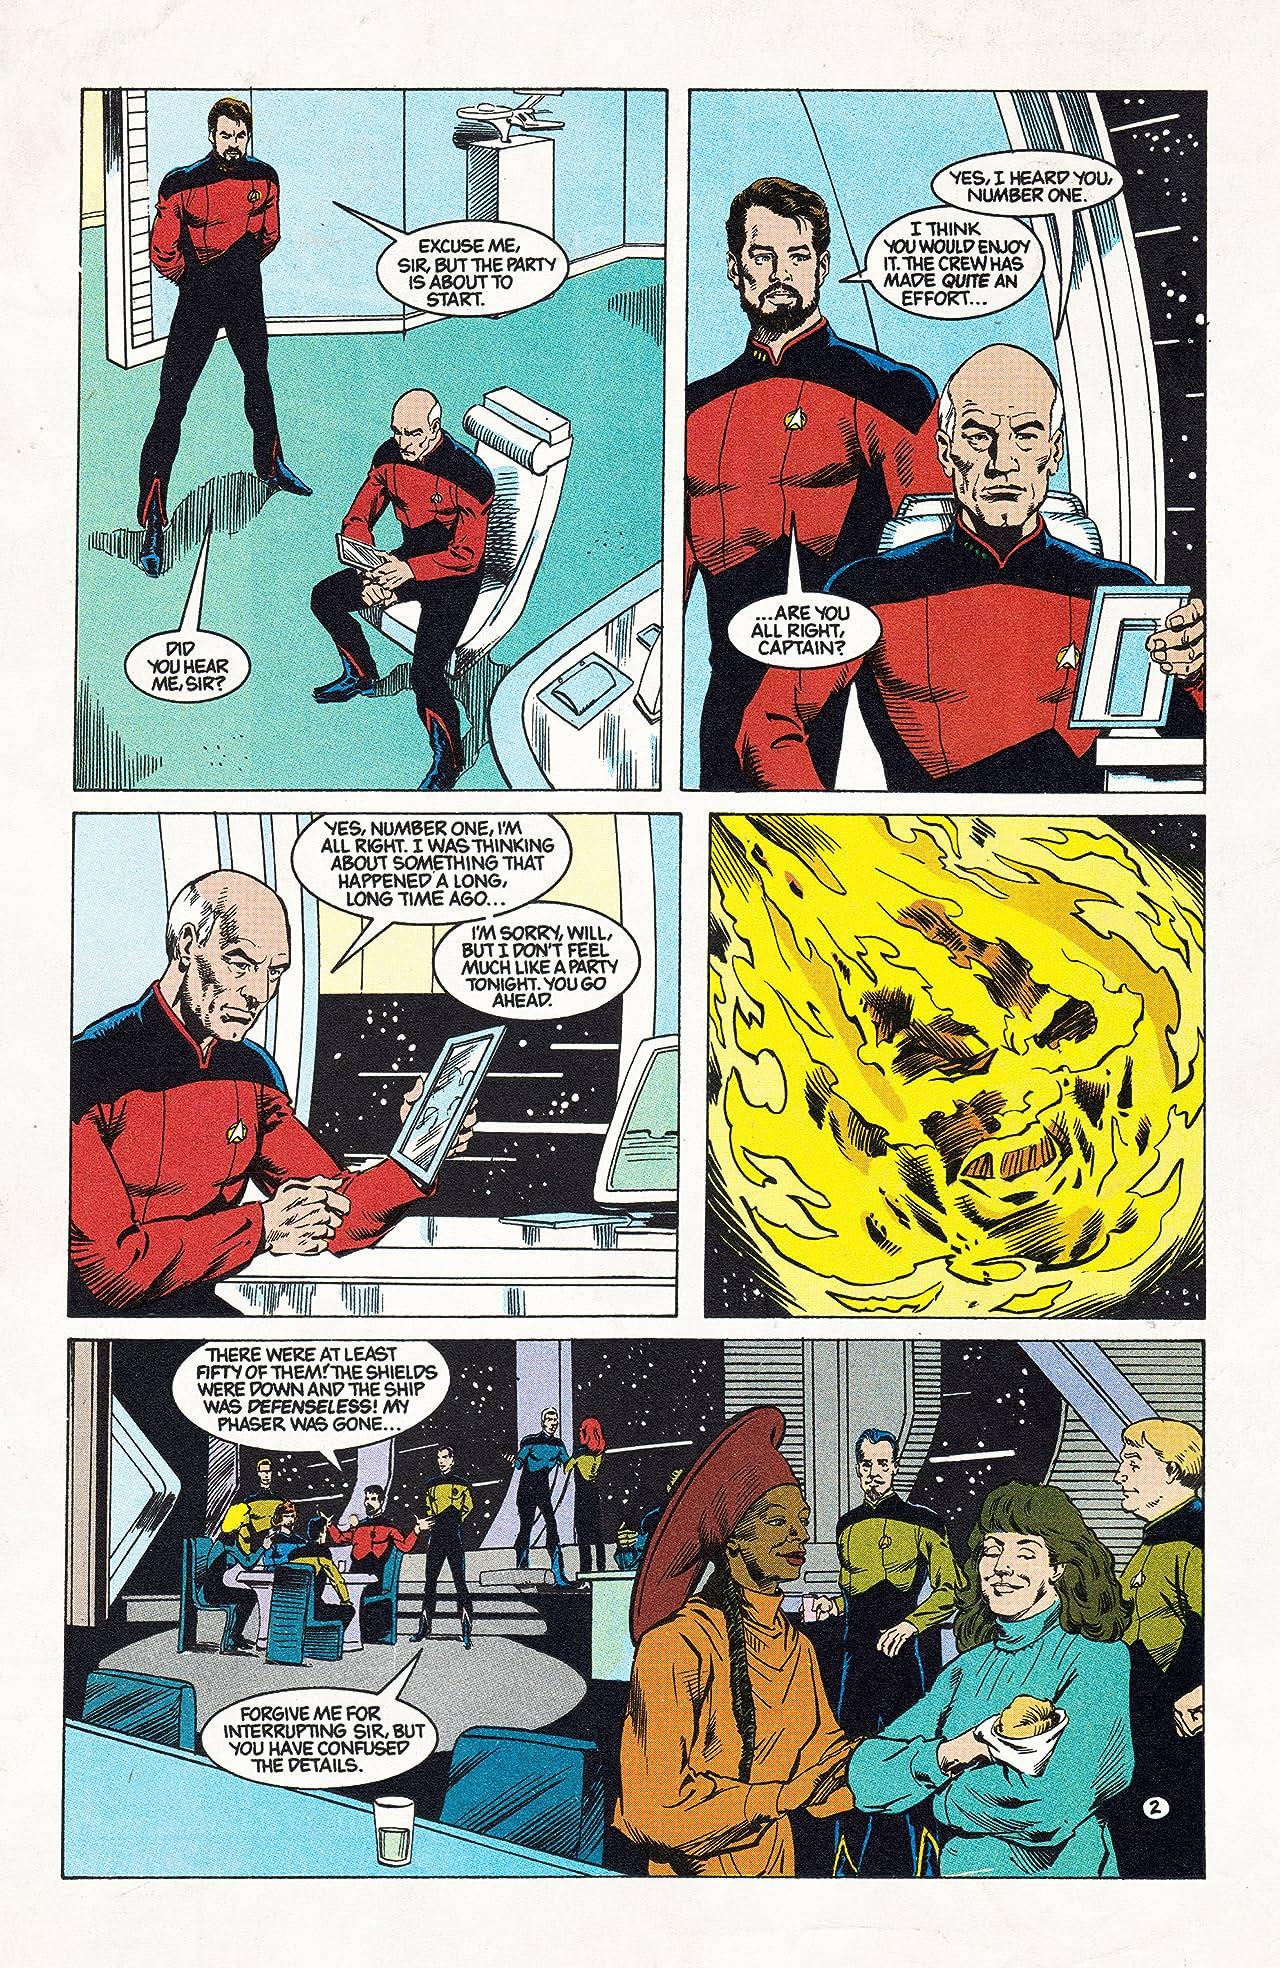 Star Trek: The Next Generation—The Gift